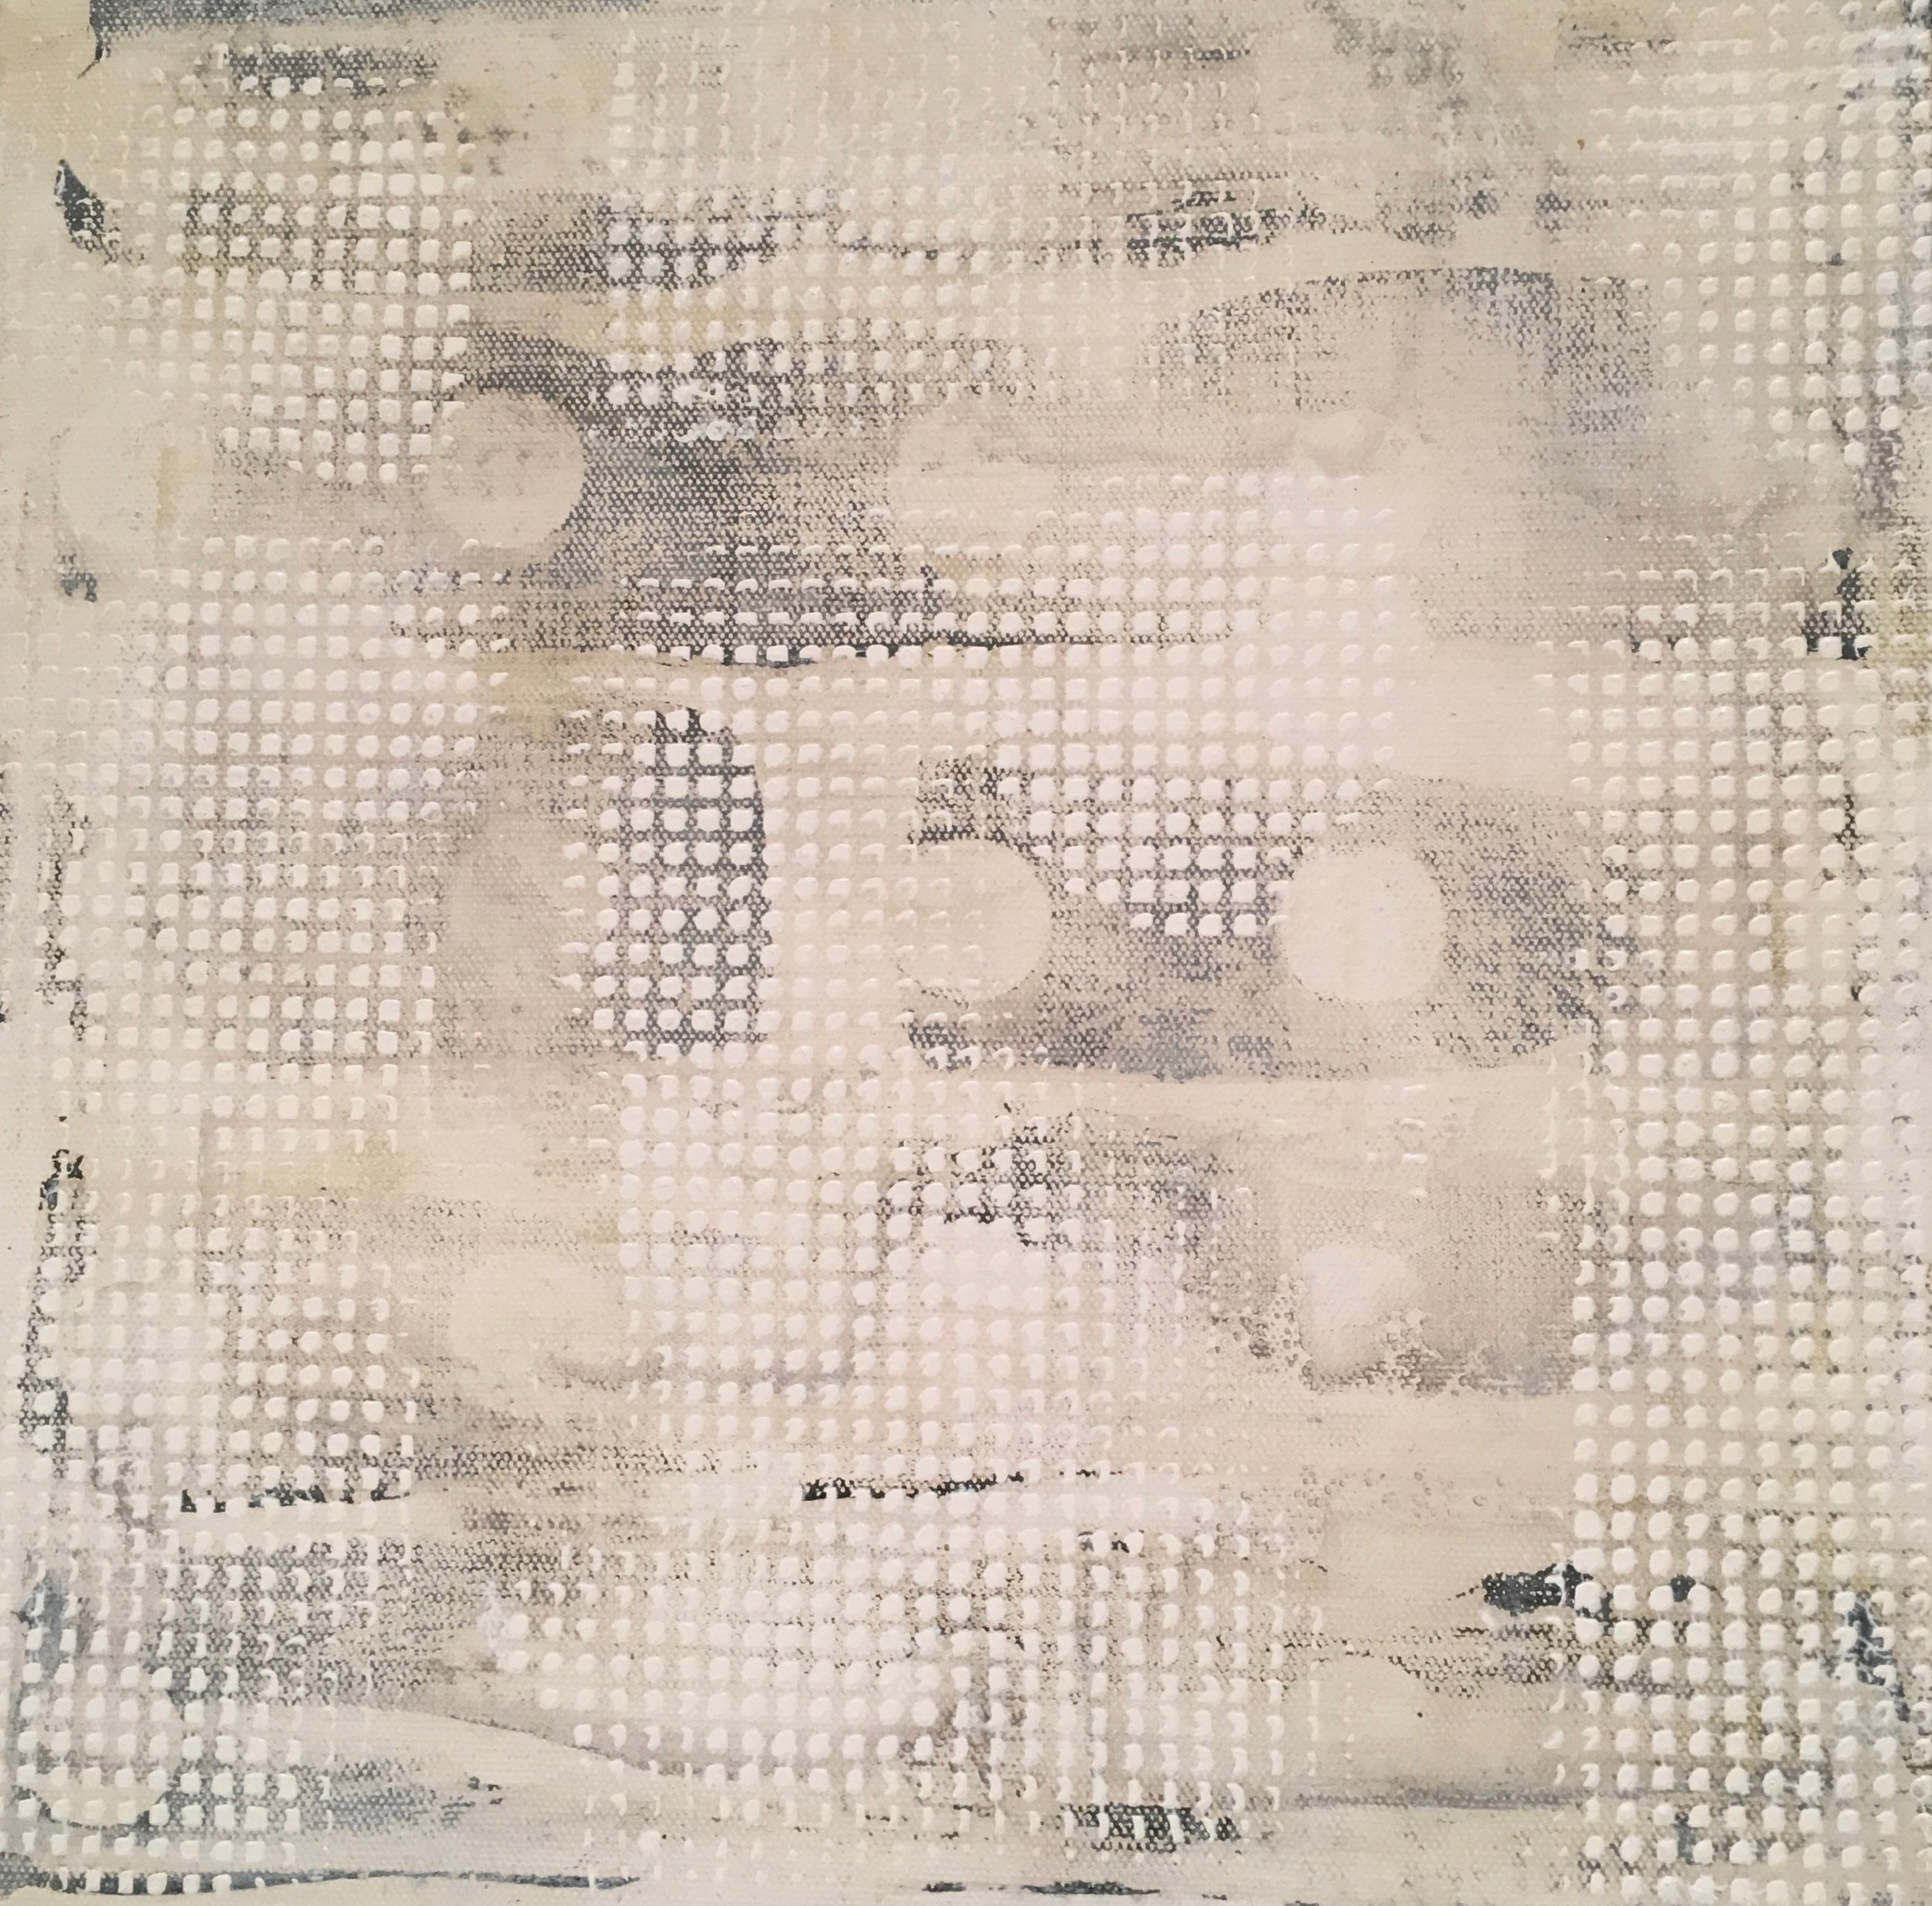 24. Manheimer_Circles in the Grid, 2015, 12%22x 12%22, acrylic on canvas.jpg